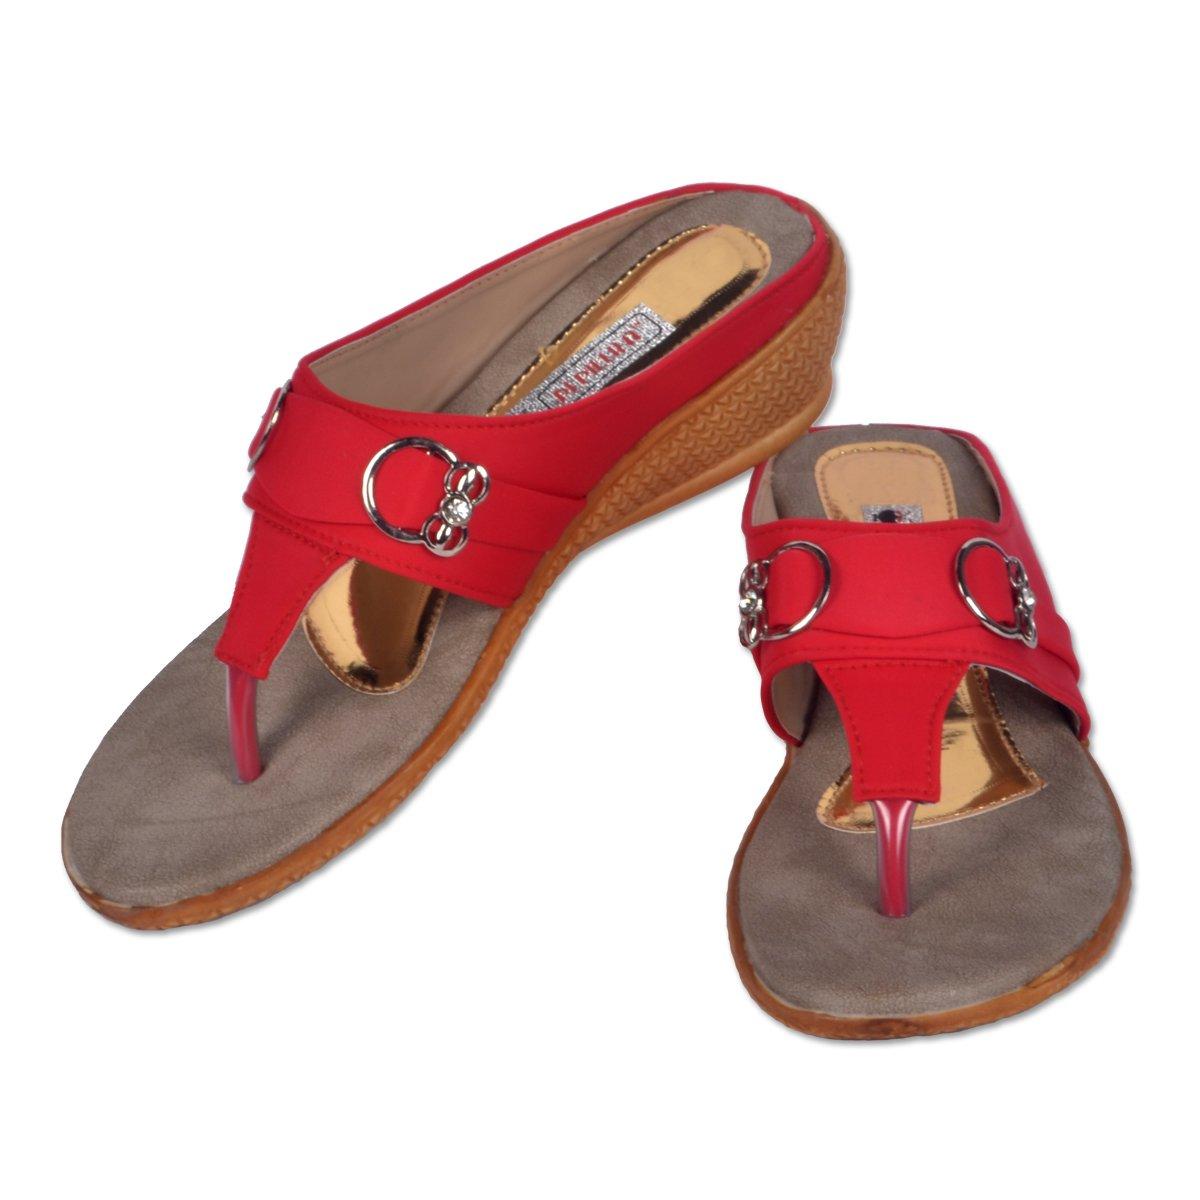 Womens sandals flipkart - Pipilika On Twitter Pipilika Red Wedges Women Footwear Available Flipkart Https T Co Wy2igoh3v3 Happyshopping Arbazaar_shop